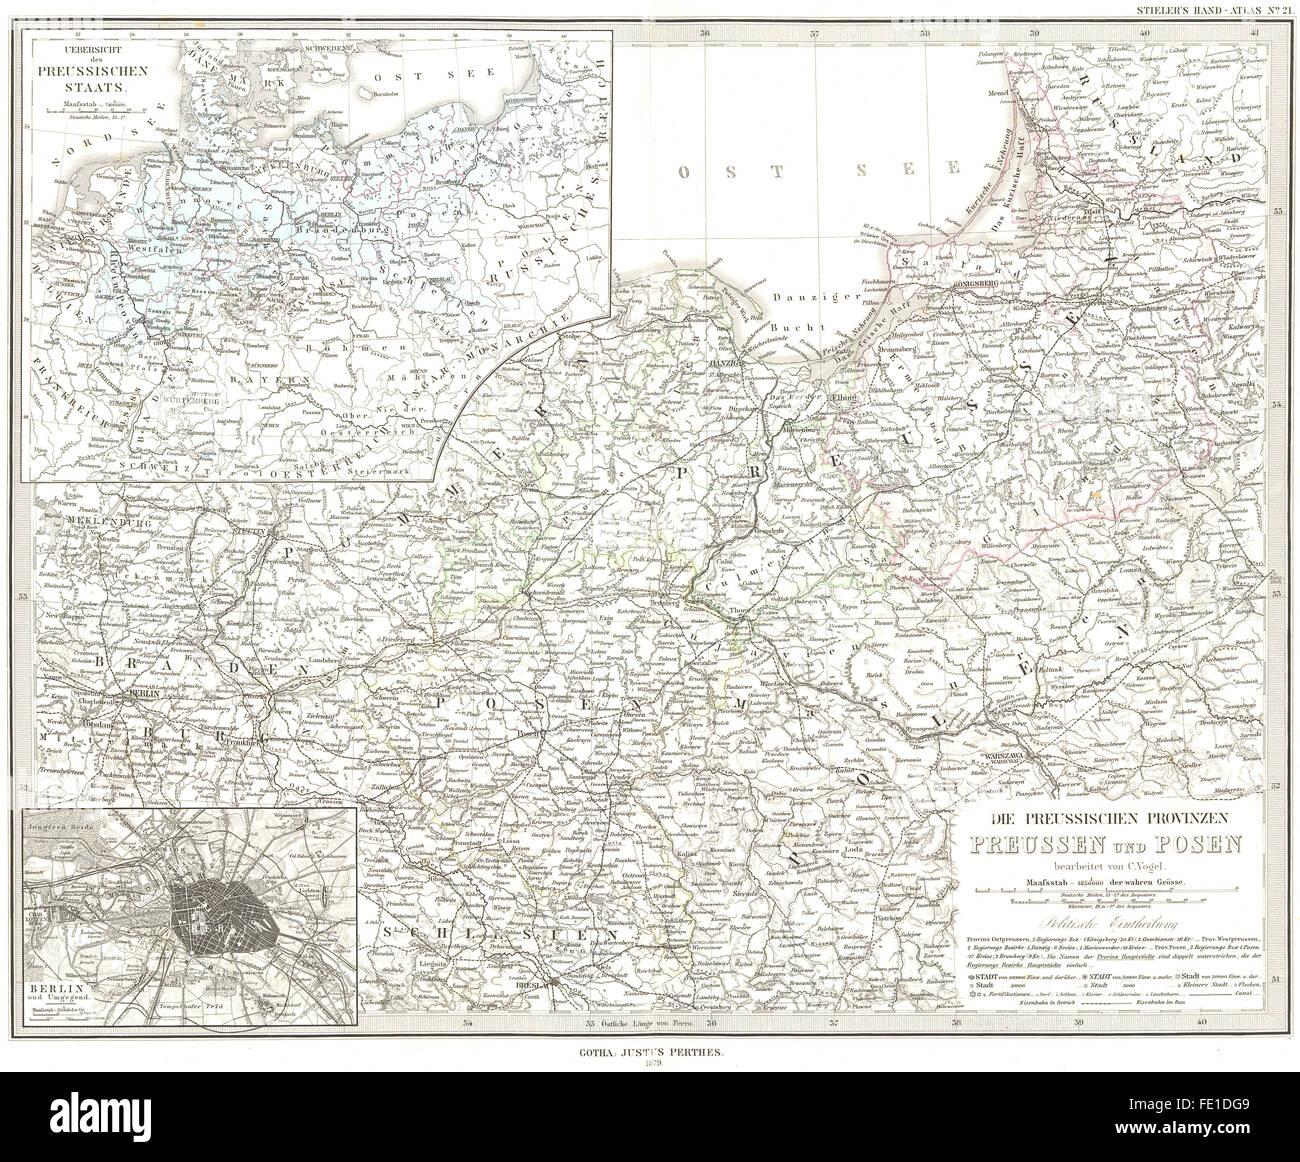 POLAND: Preussen Posen; Berlin Prussia, 1879 antique map - Stock Image